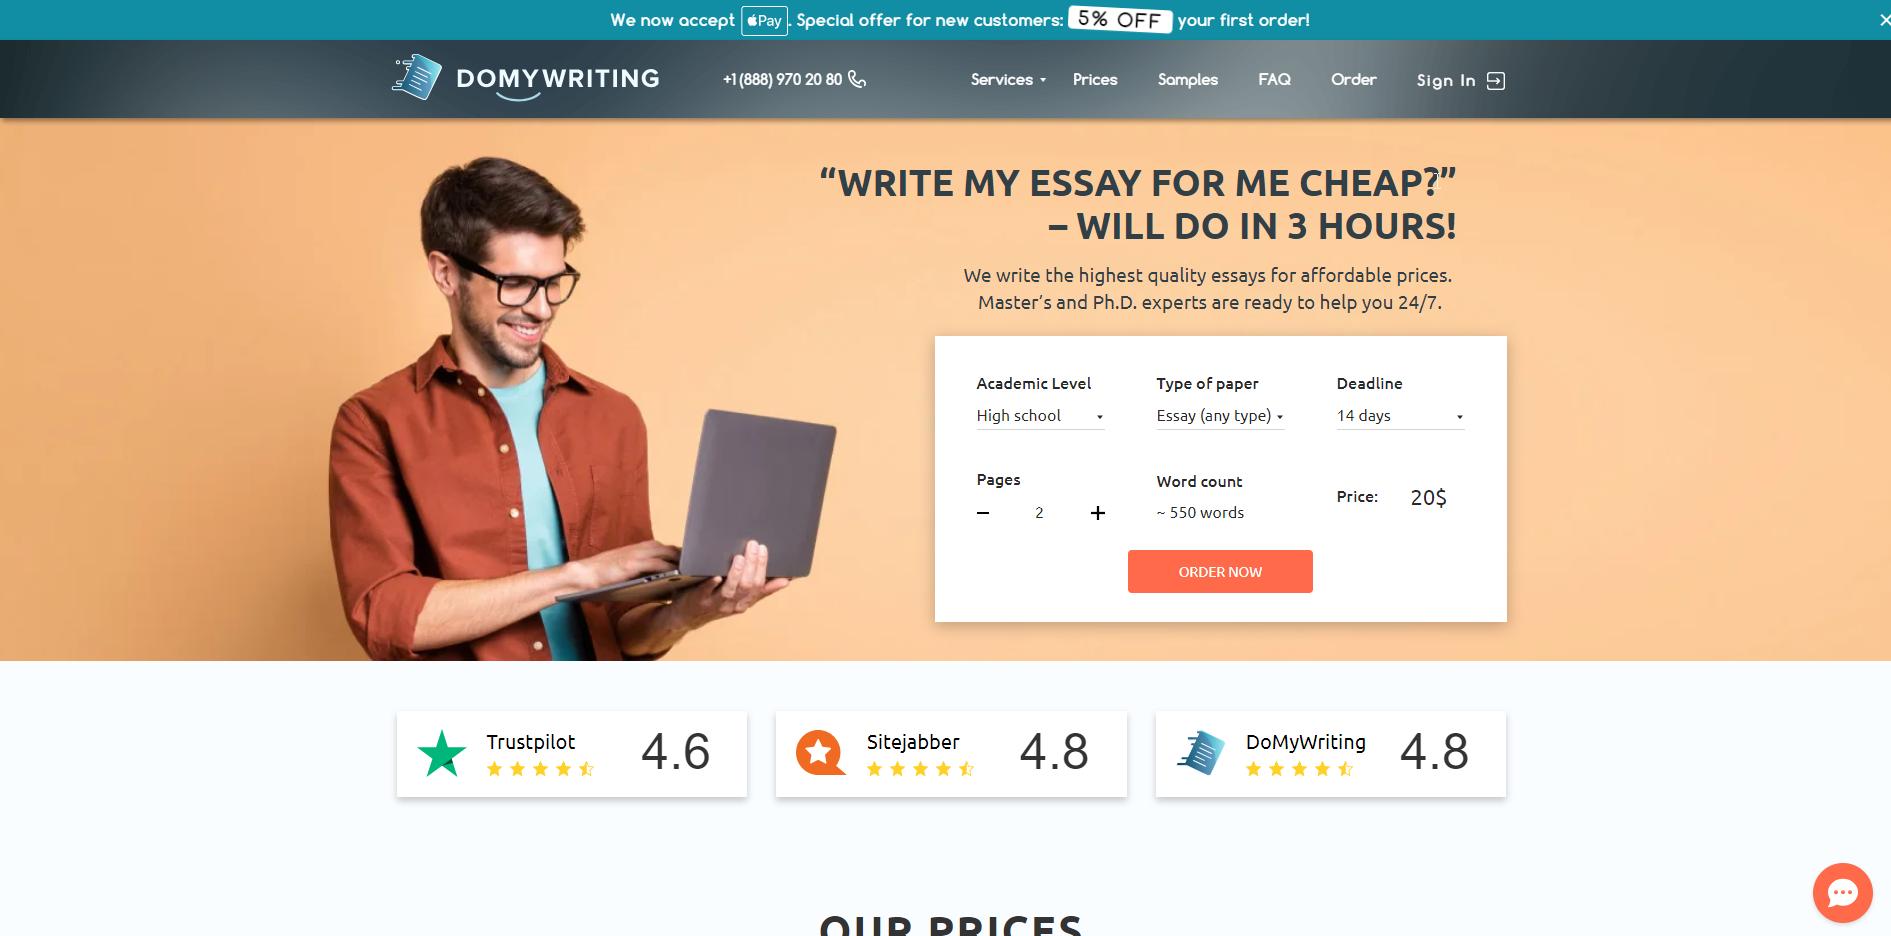 domywriting-website